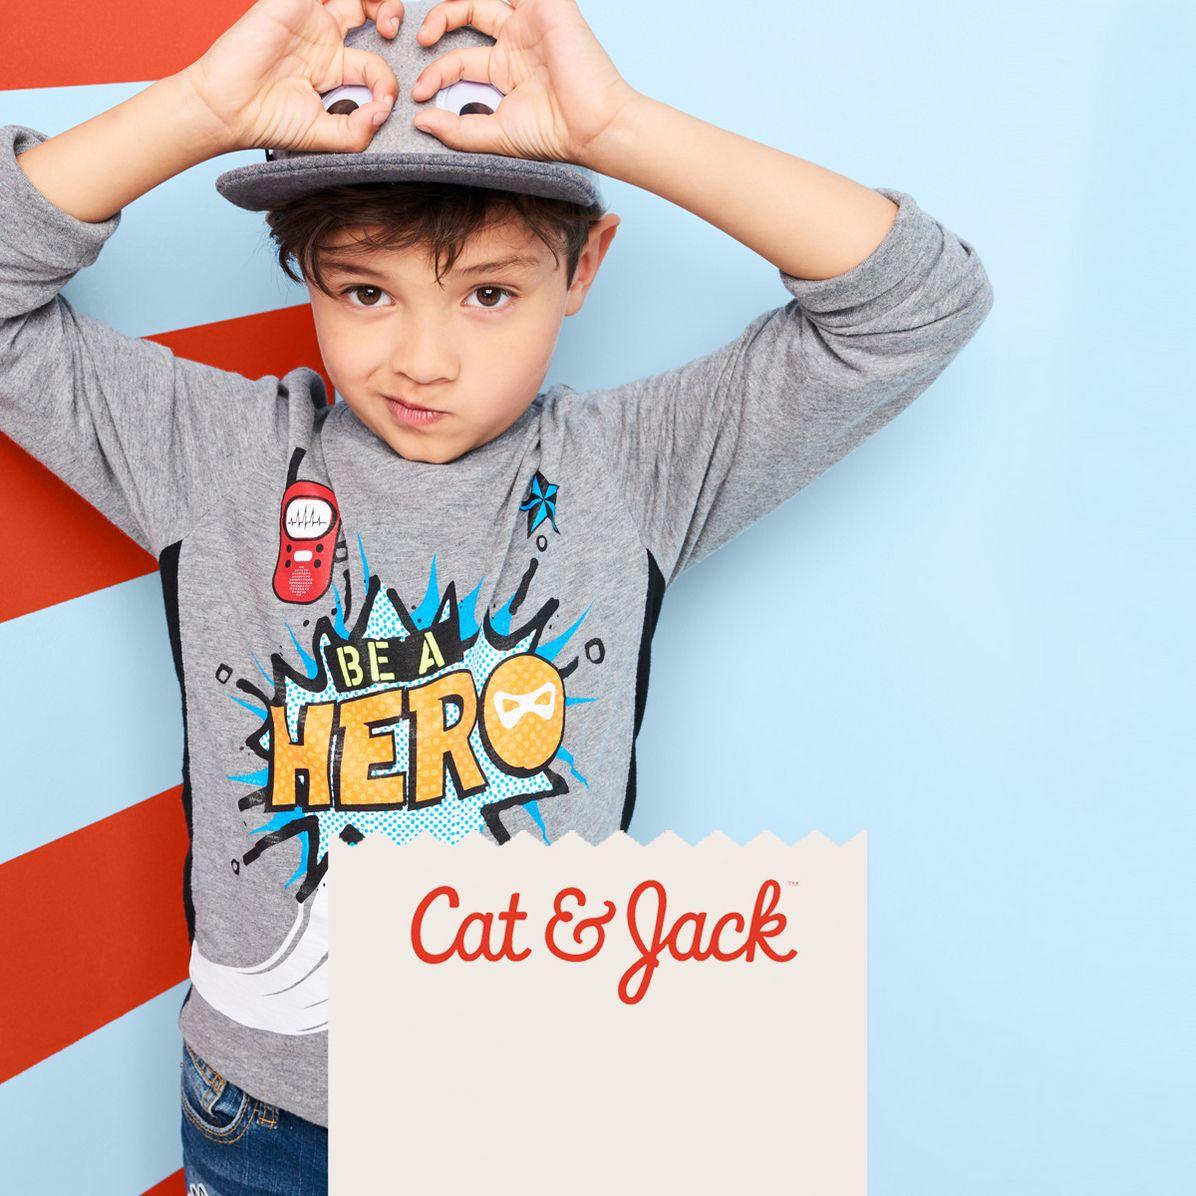 Christmas dress attire for age 57 - Cat Jack Tm